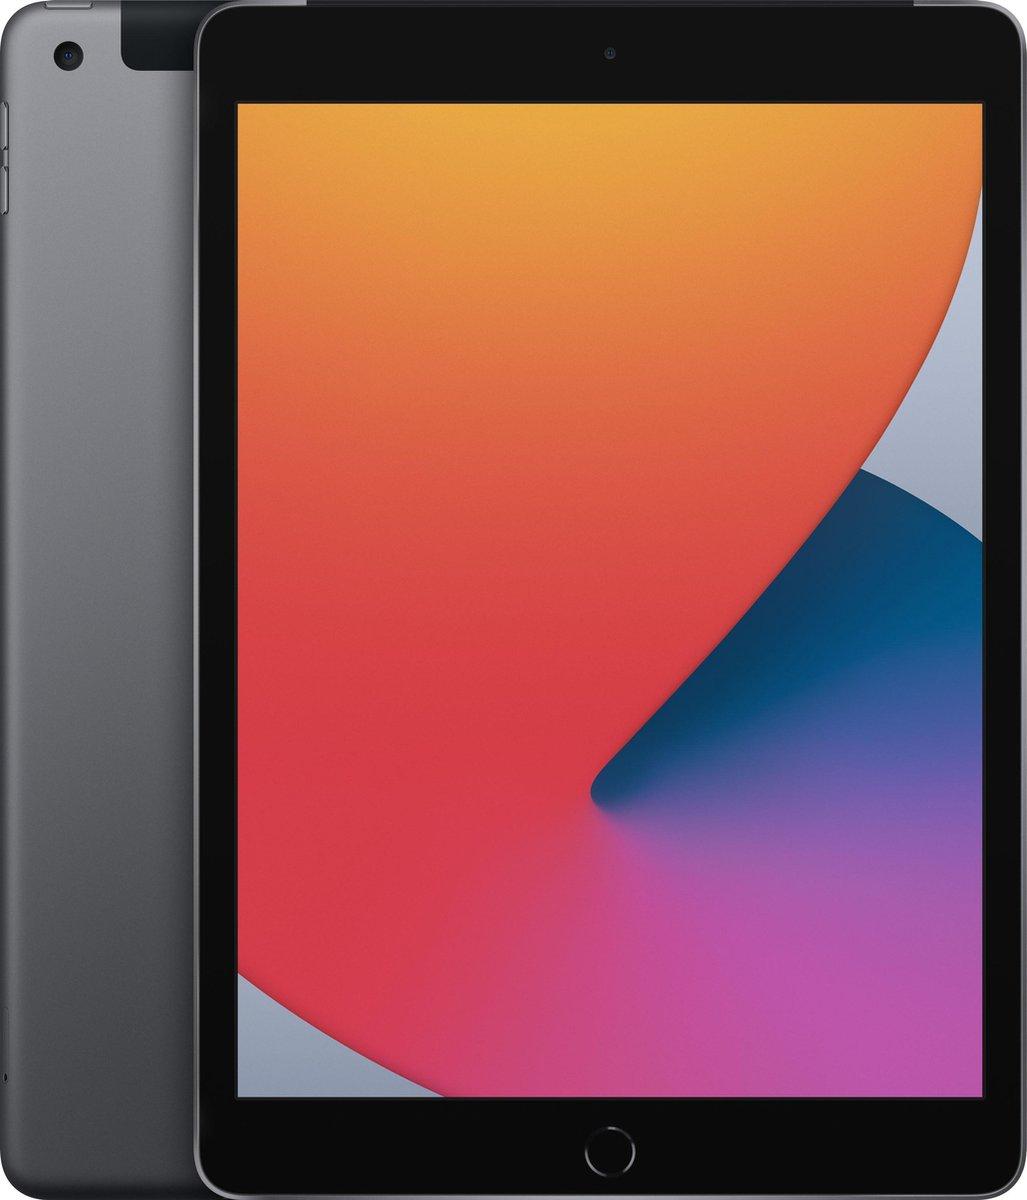 Apple iPad (2020) – 10.2 inch – WiFi + 4G – 128GB – Spacegrijs